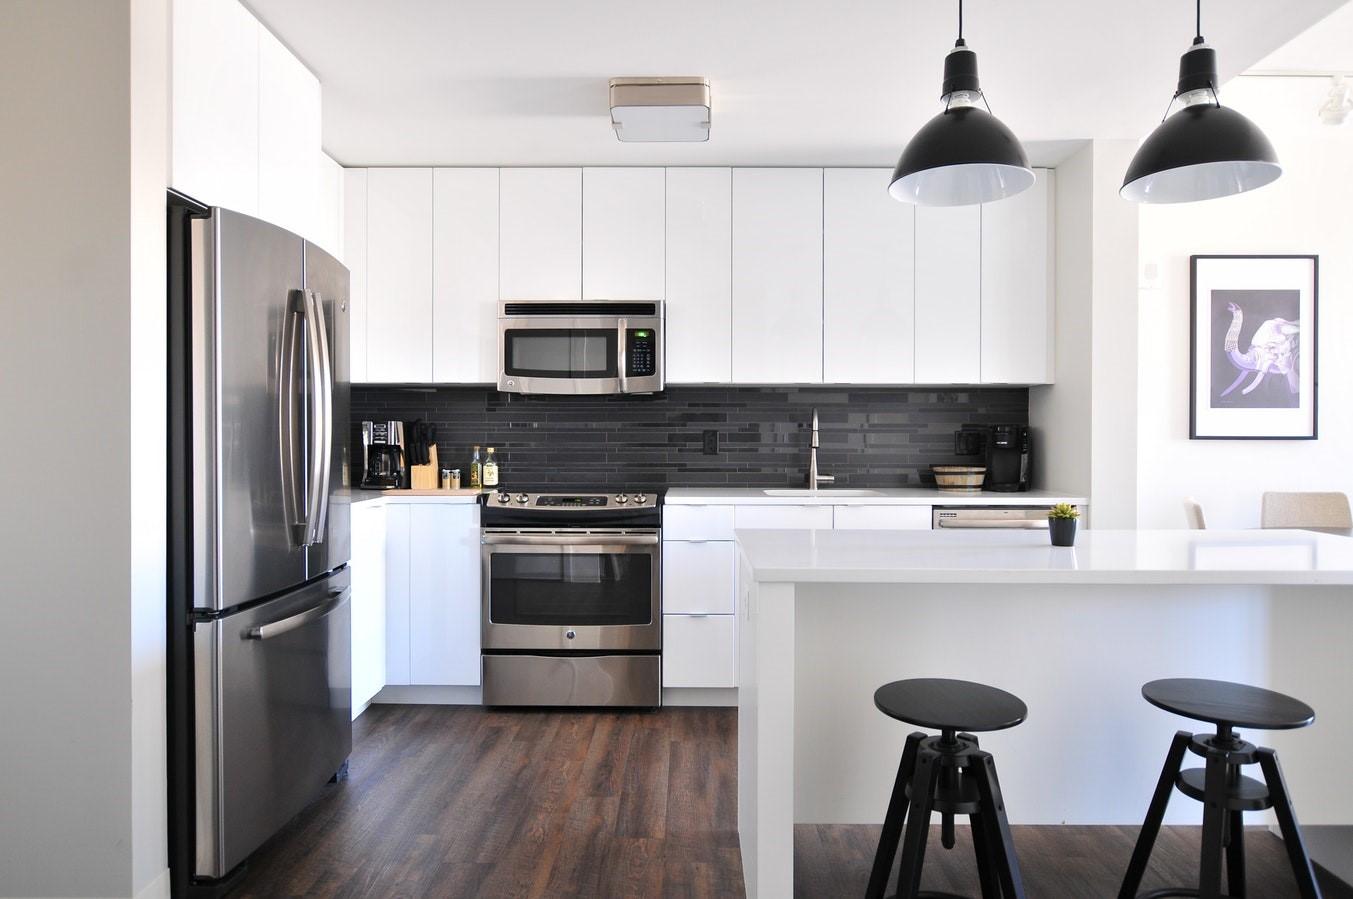 Kitchen with white cupboards, dark hardwood floor and stainless steel applicances